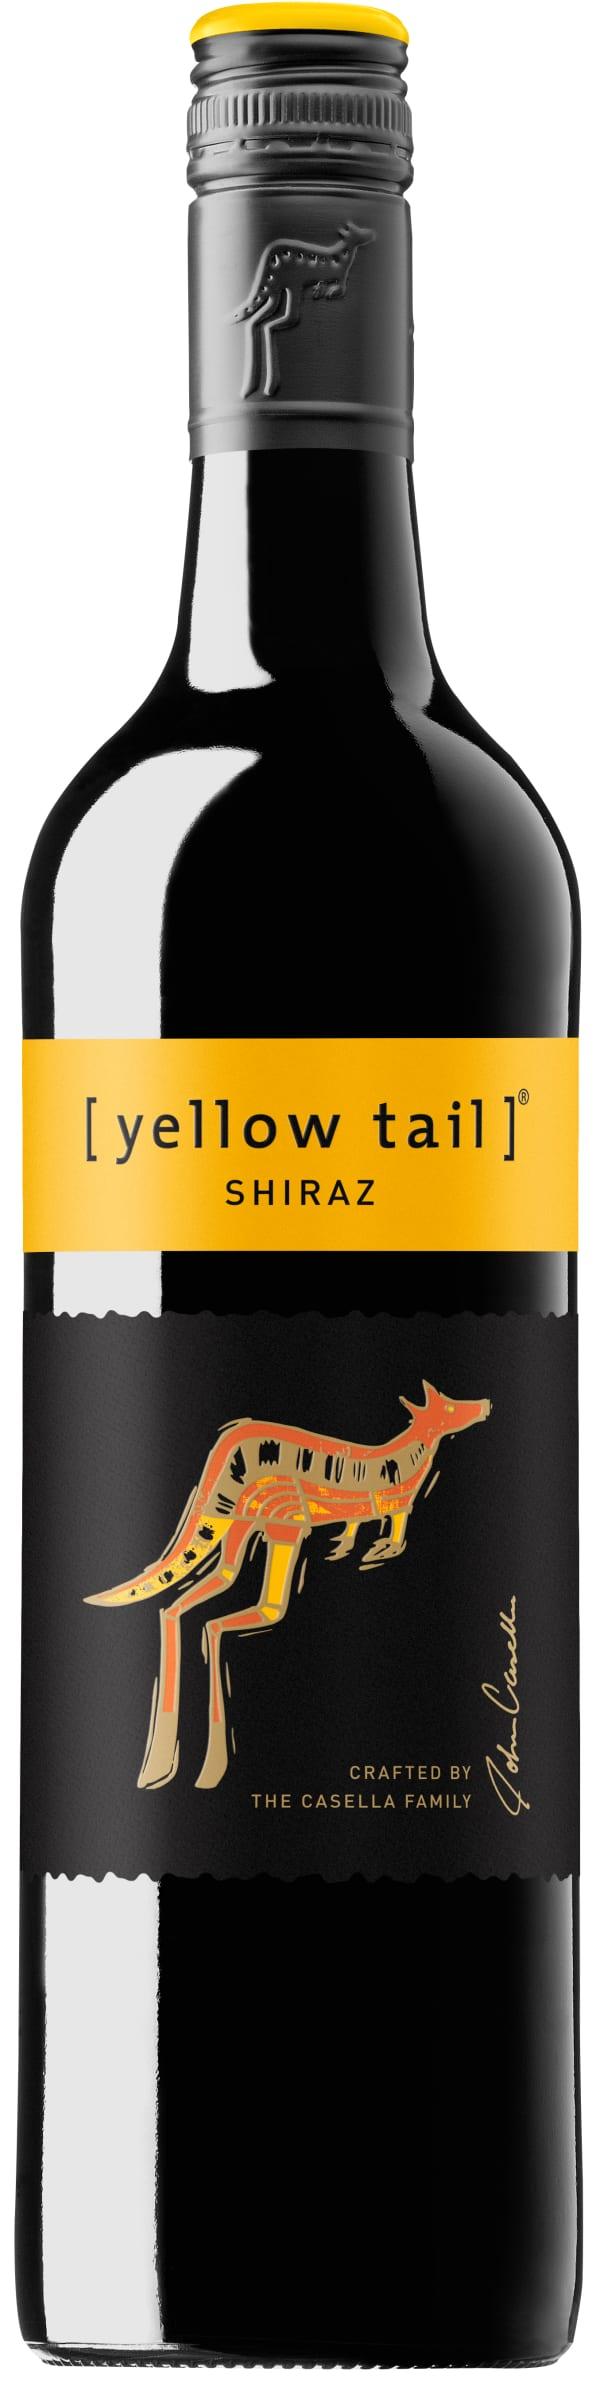 Yellow Tail Shiraz 2019